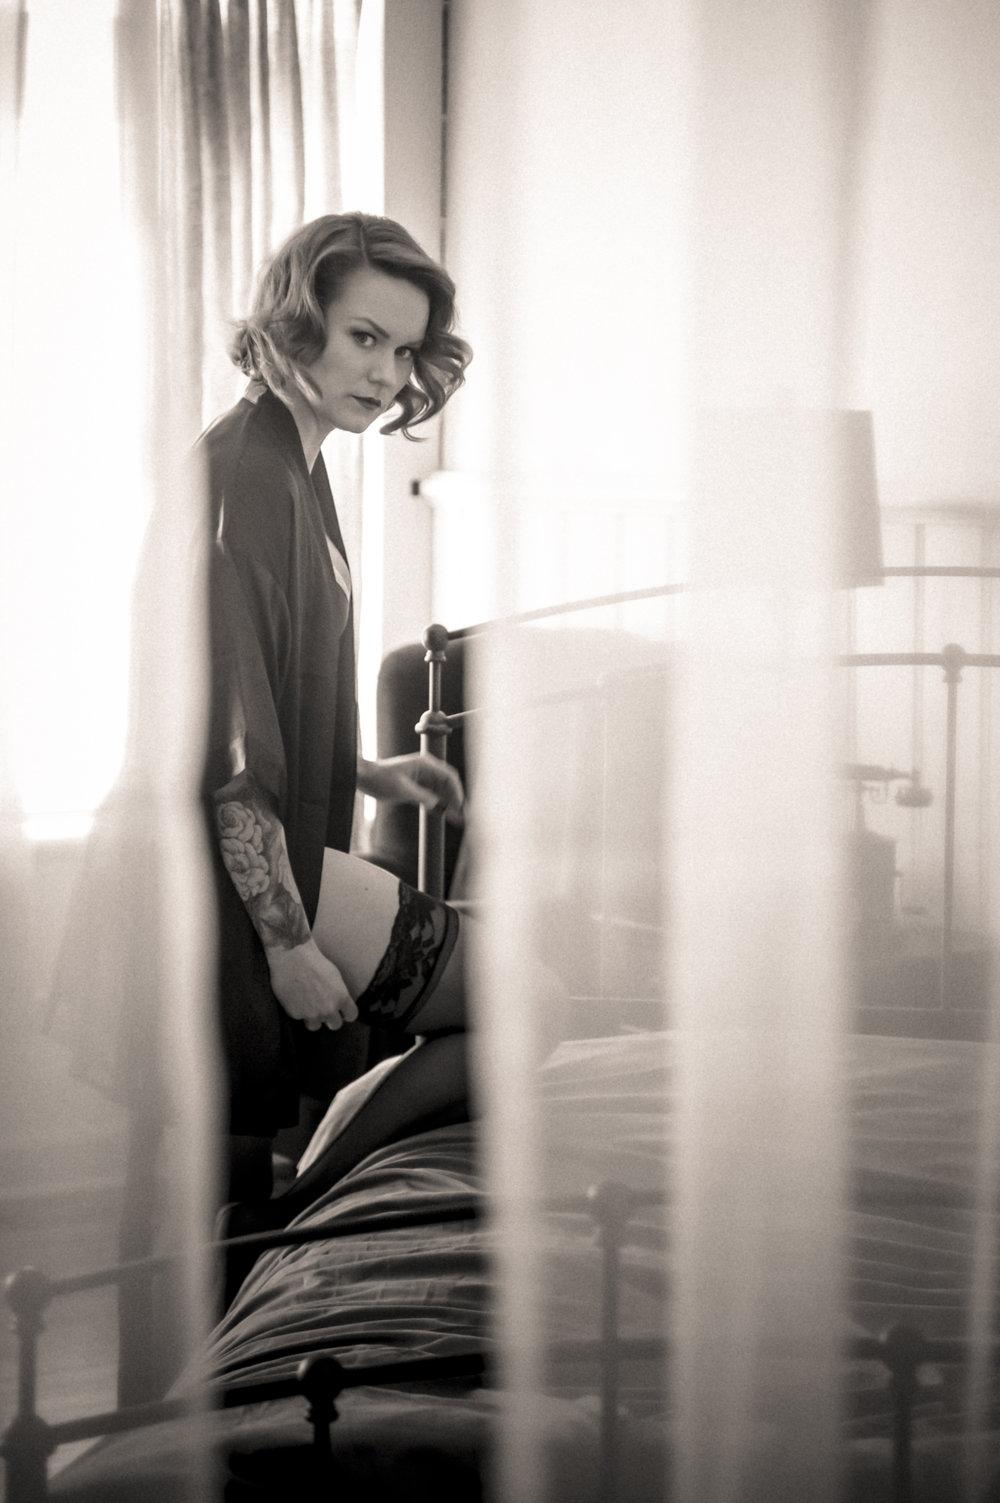 Marta-Hewson-Kim-Murkovich-boudoir-voyeur.jpg